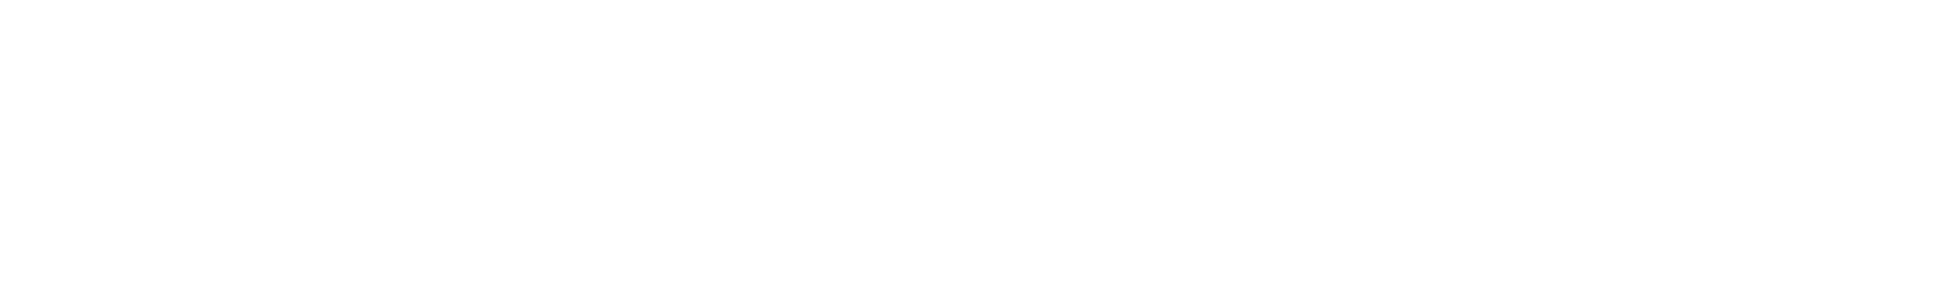 lboc-white-logo2x